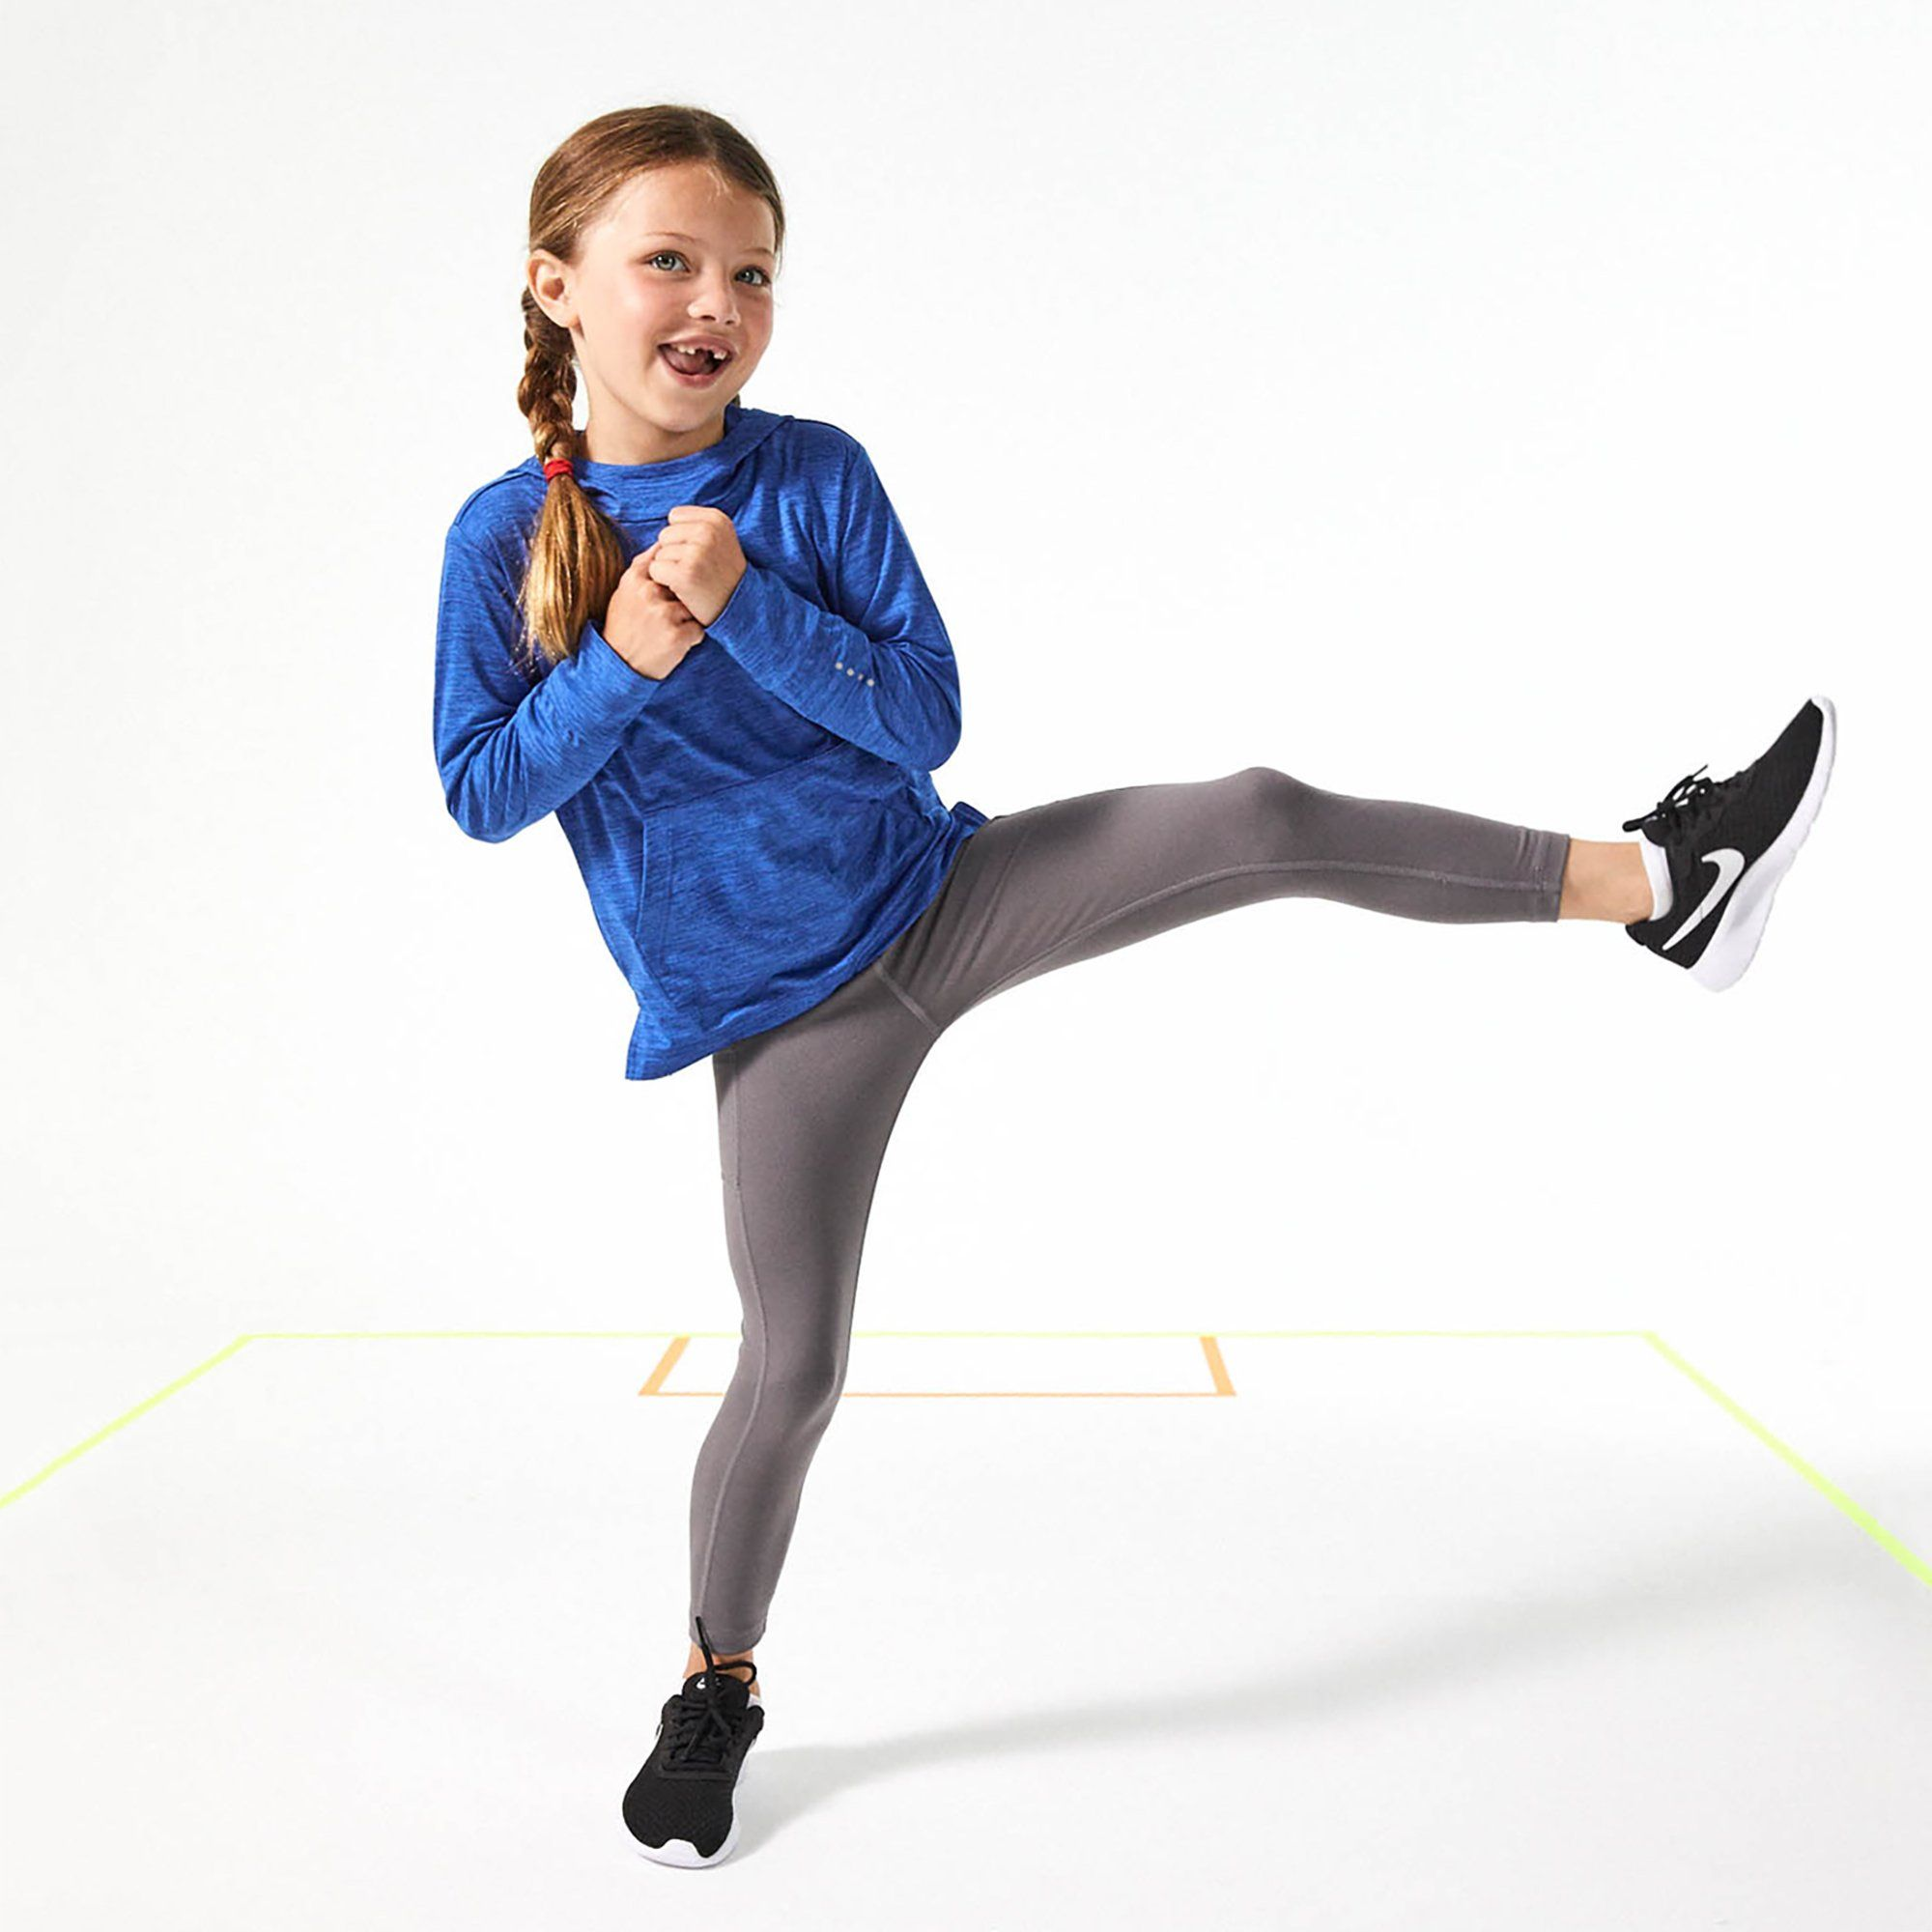 Motionwear Flat Waist Capri Leggings - SOLEUS DANCE